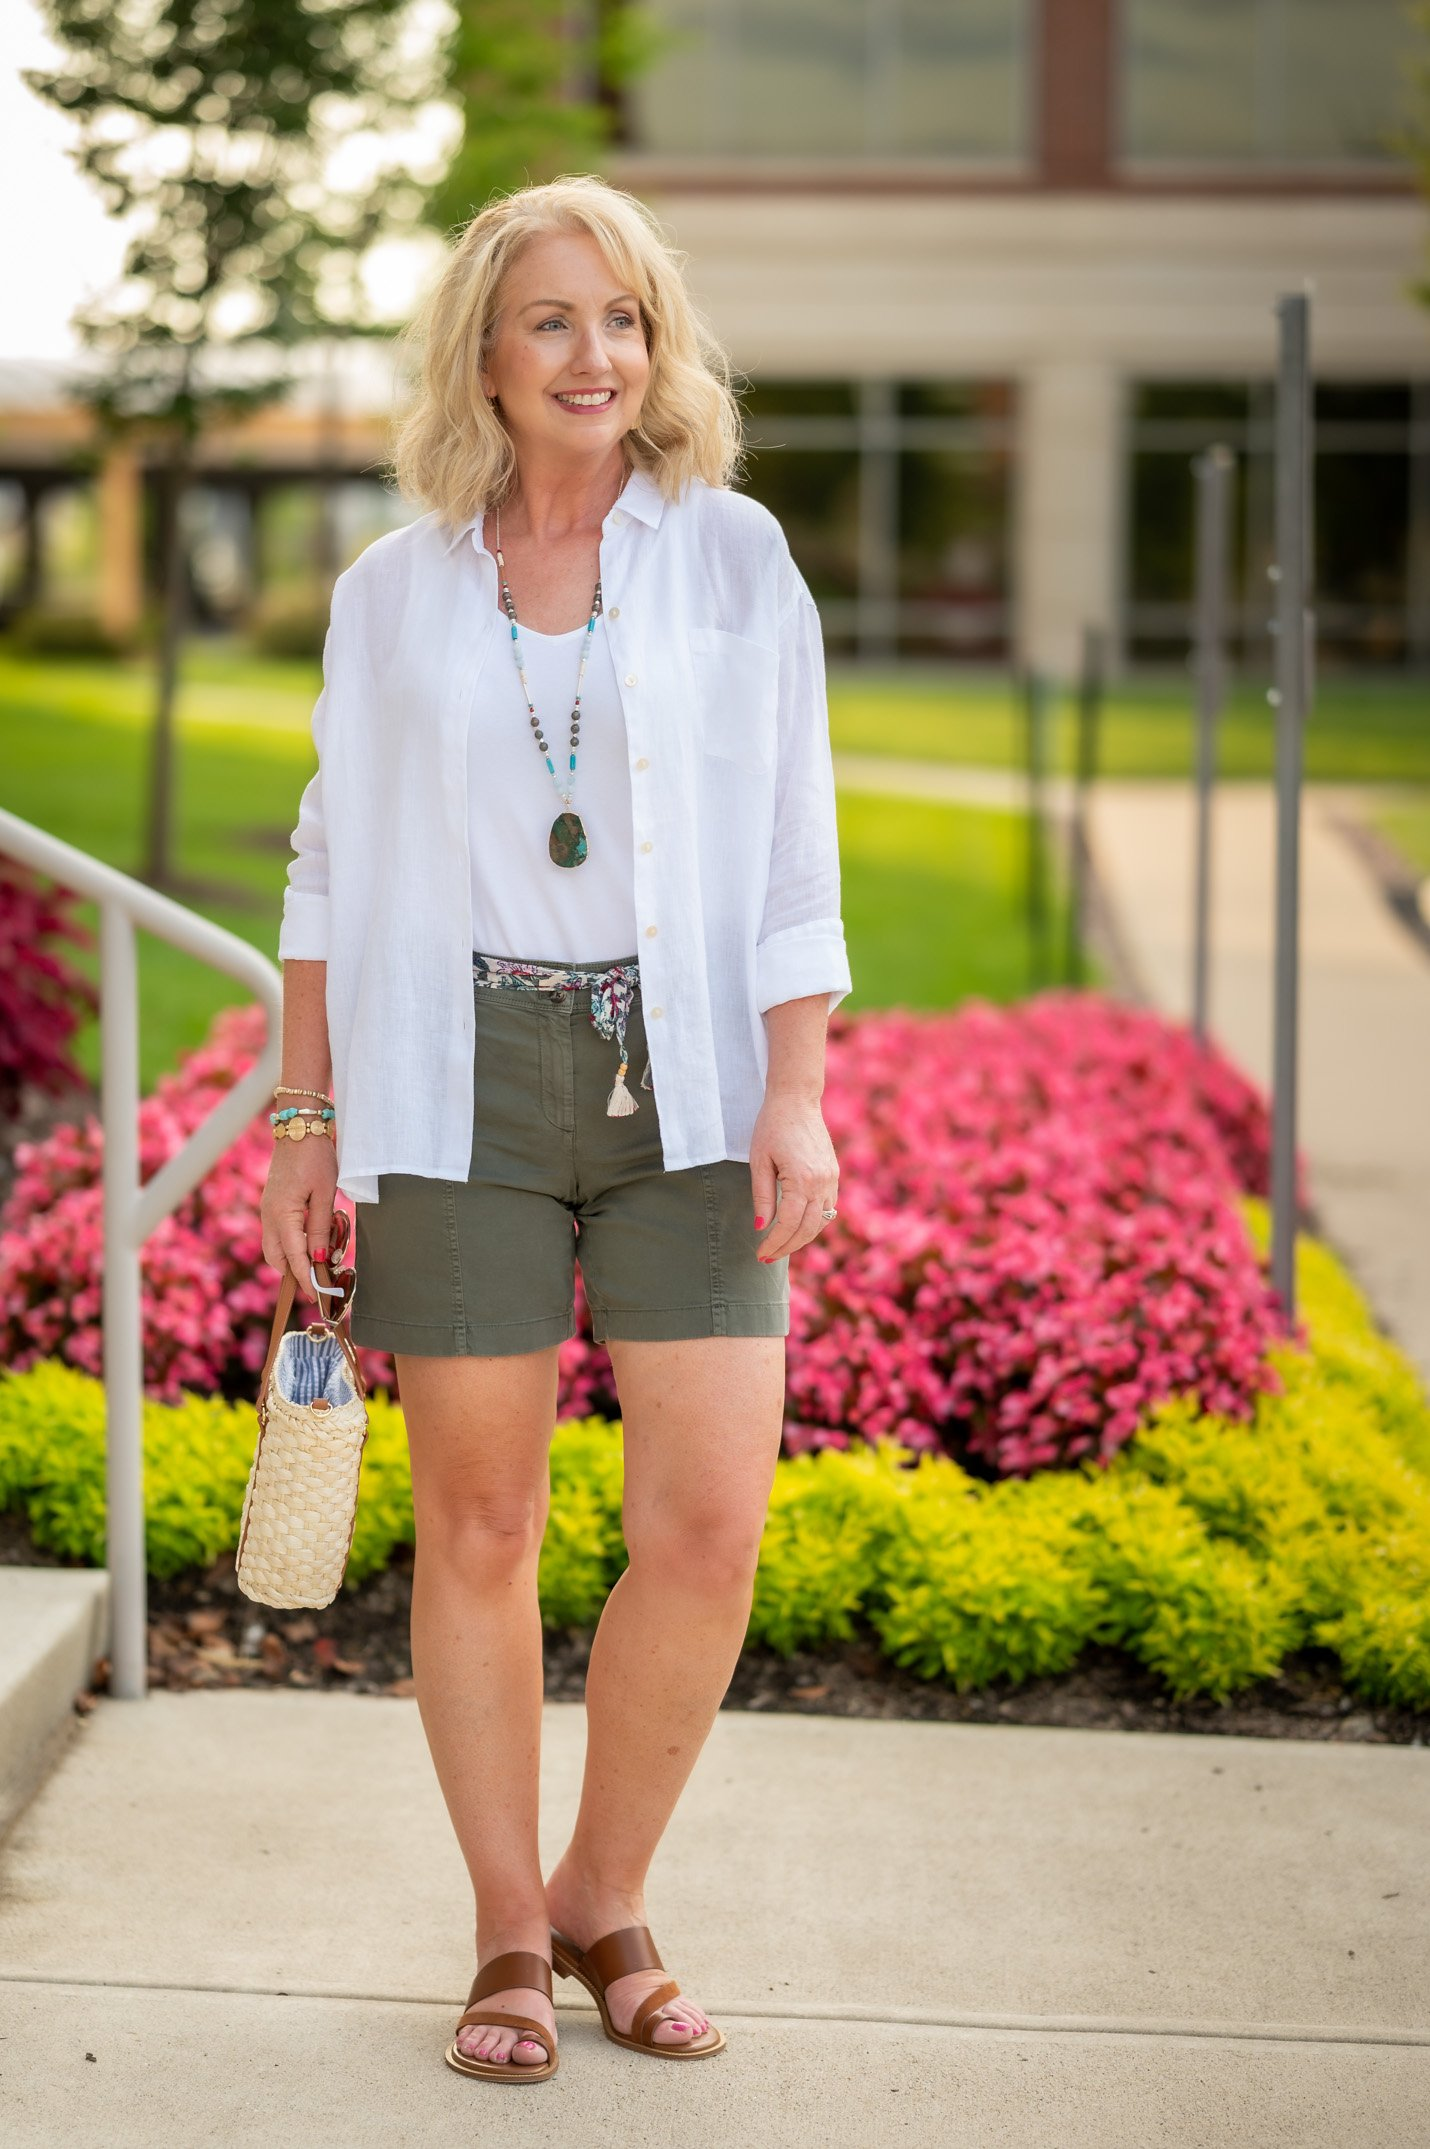 Shorts from J.Jill